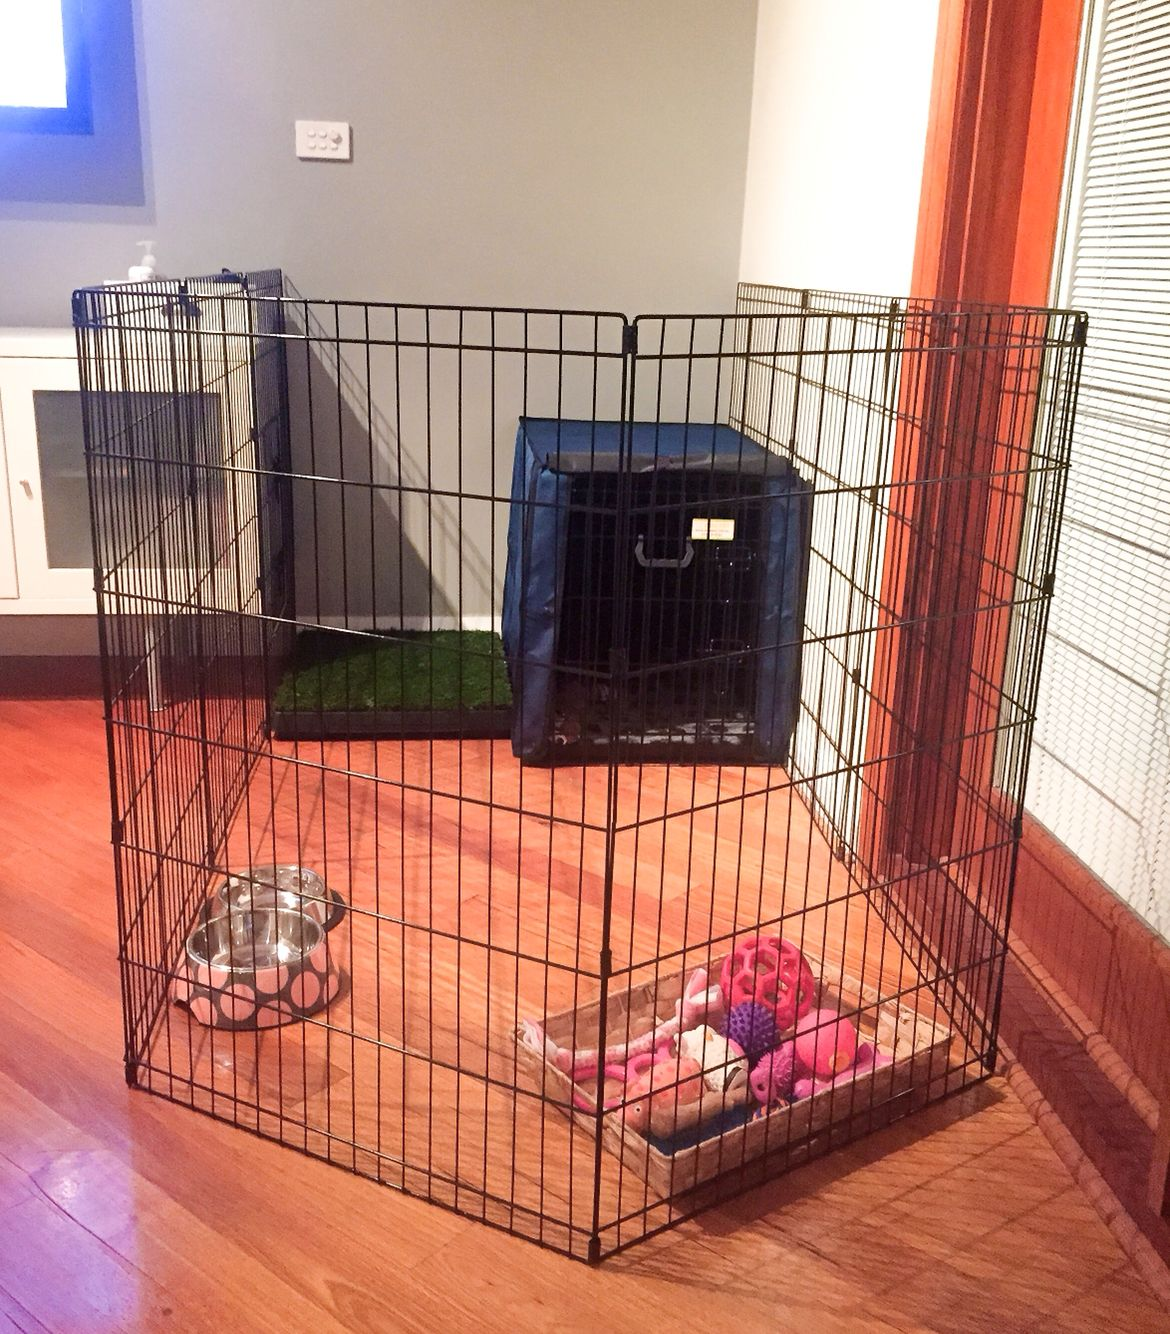 Sophie S Bedroom Puppy Set Up Play Pen Australian Multi Gen Labradoodle Puppy Pens Puppy Crate Dog Playpen